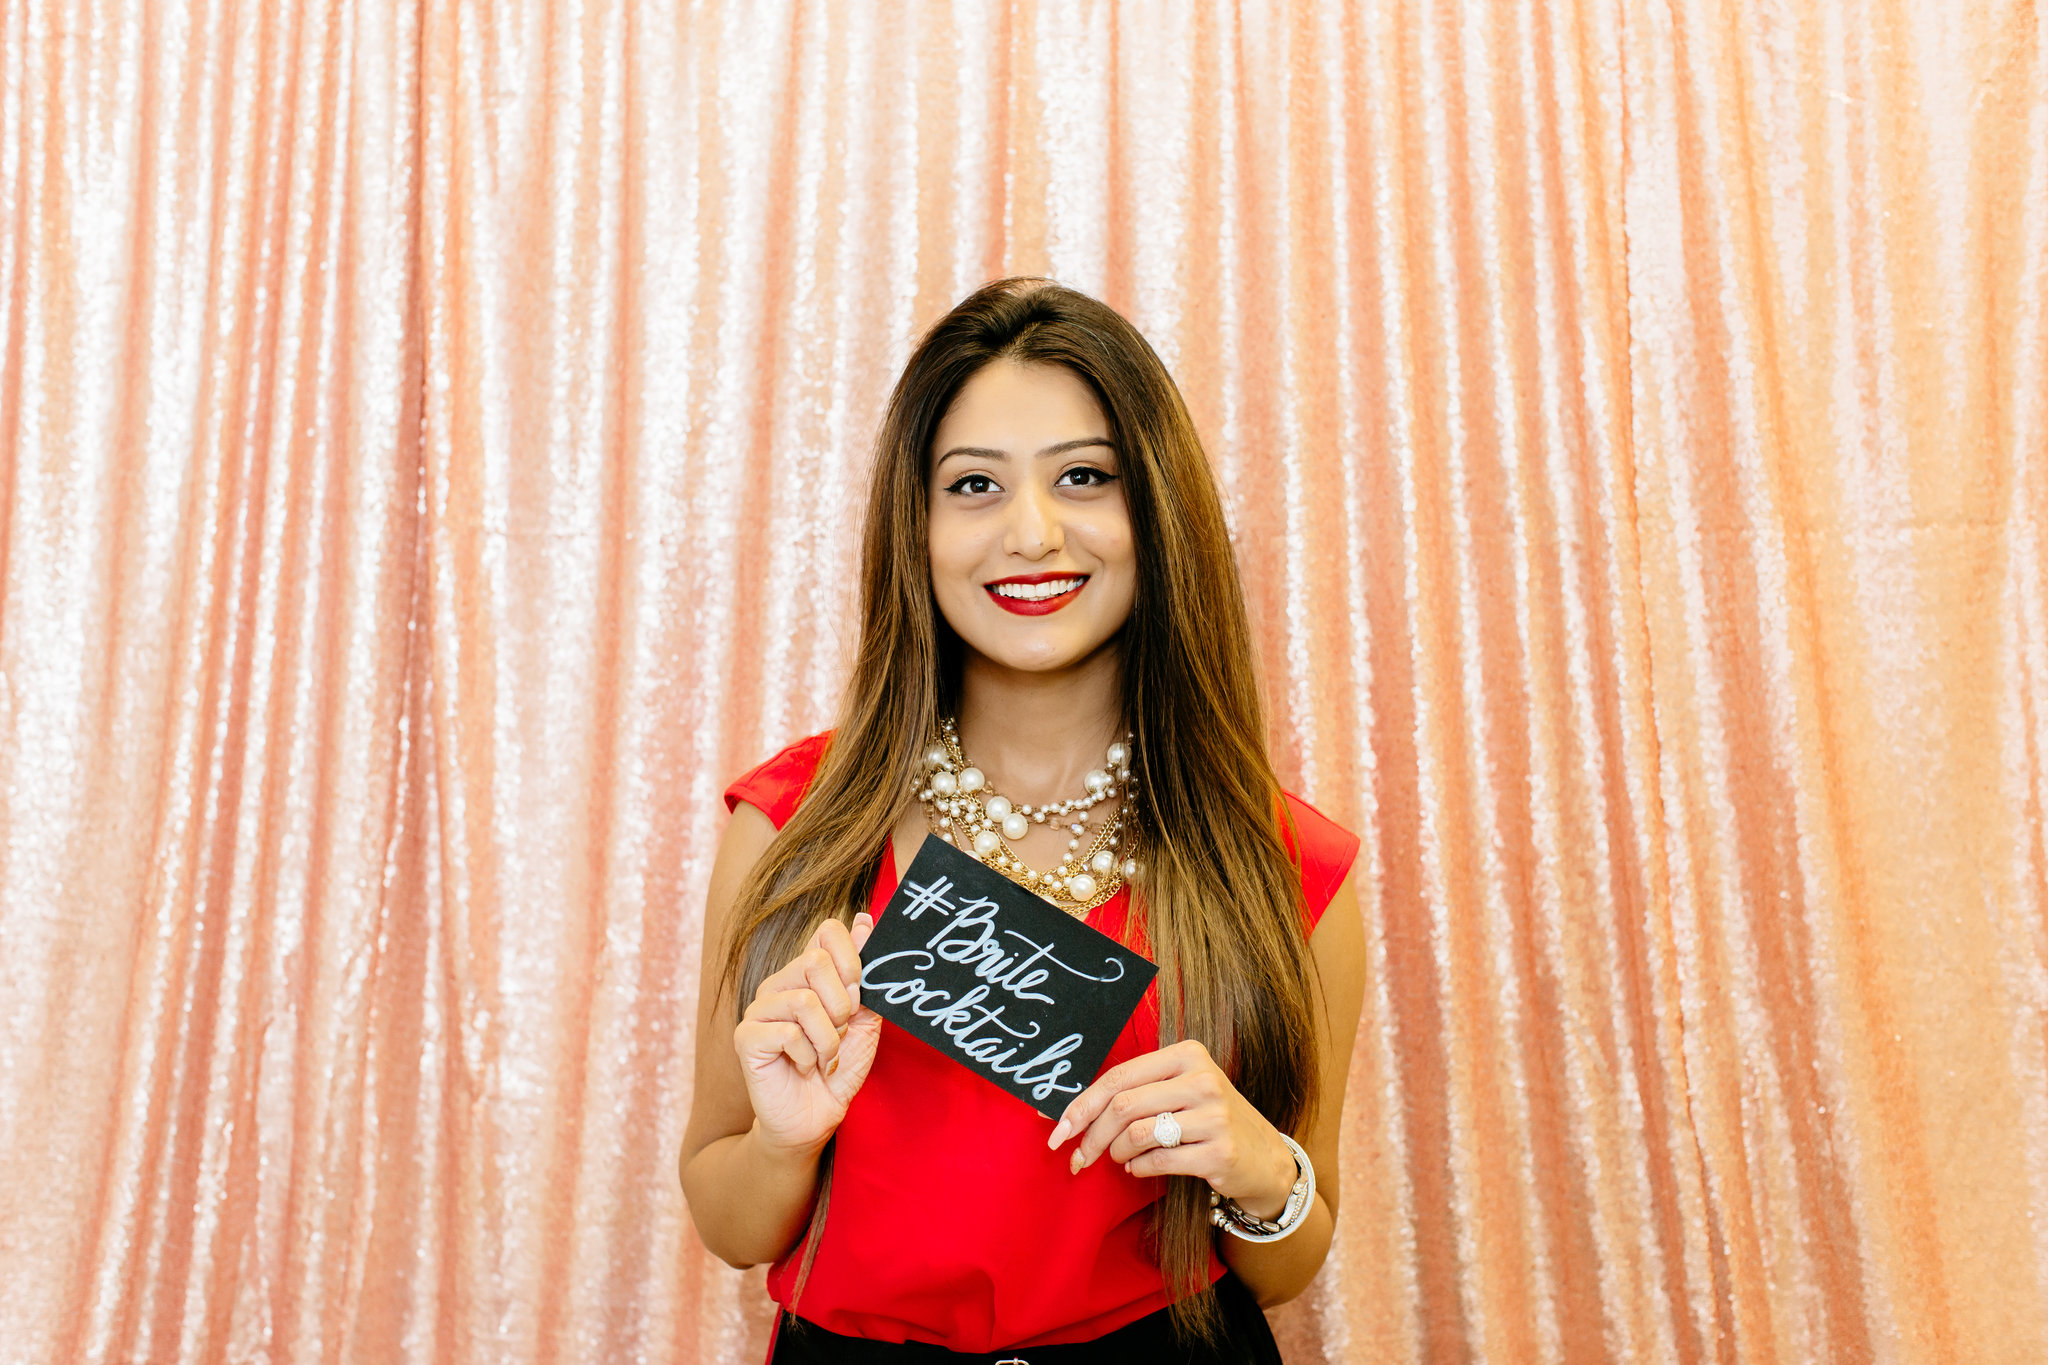 Alexa-Vossler-Photo_Dallas-Event-Photographer_Brite-Bar-Beauty-2018-Lipstick-Launch-Party-10.jpg